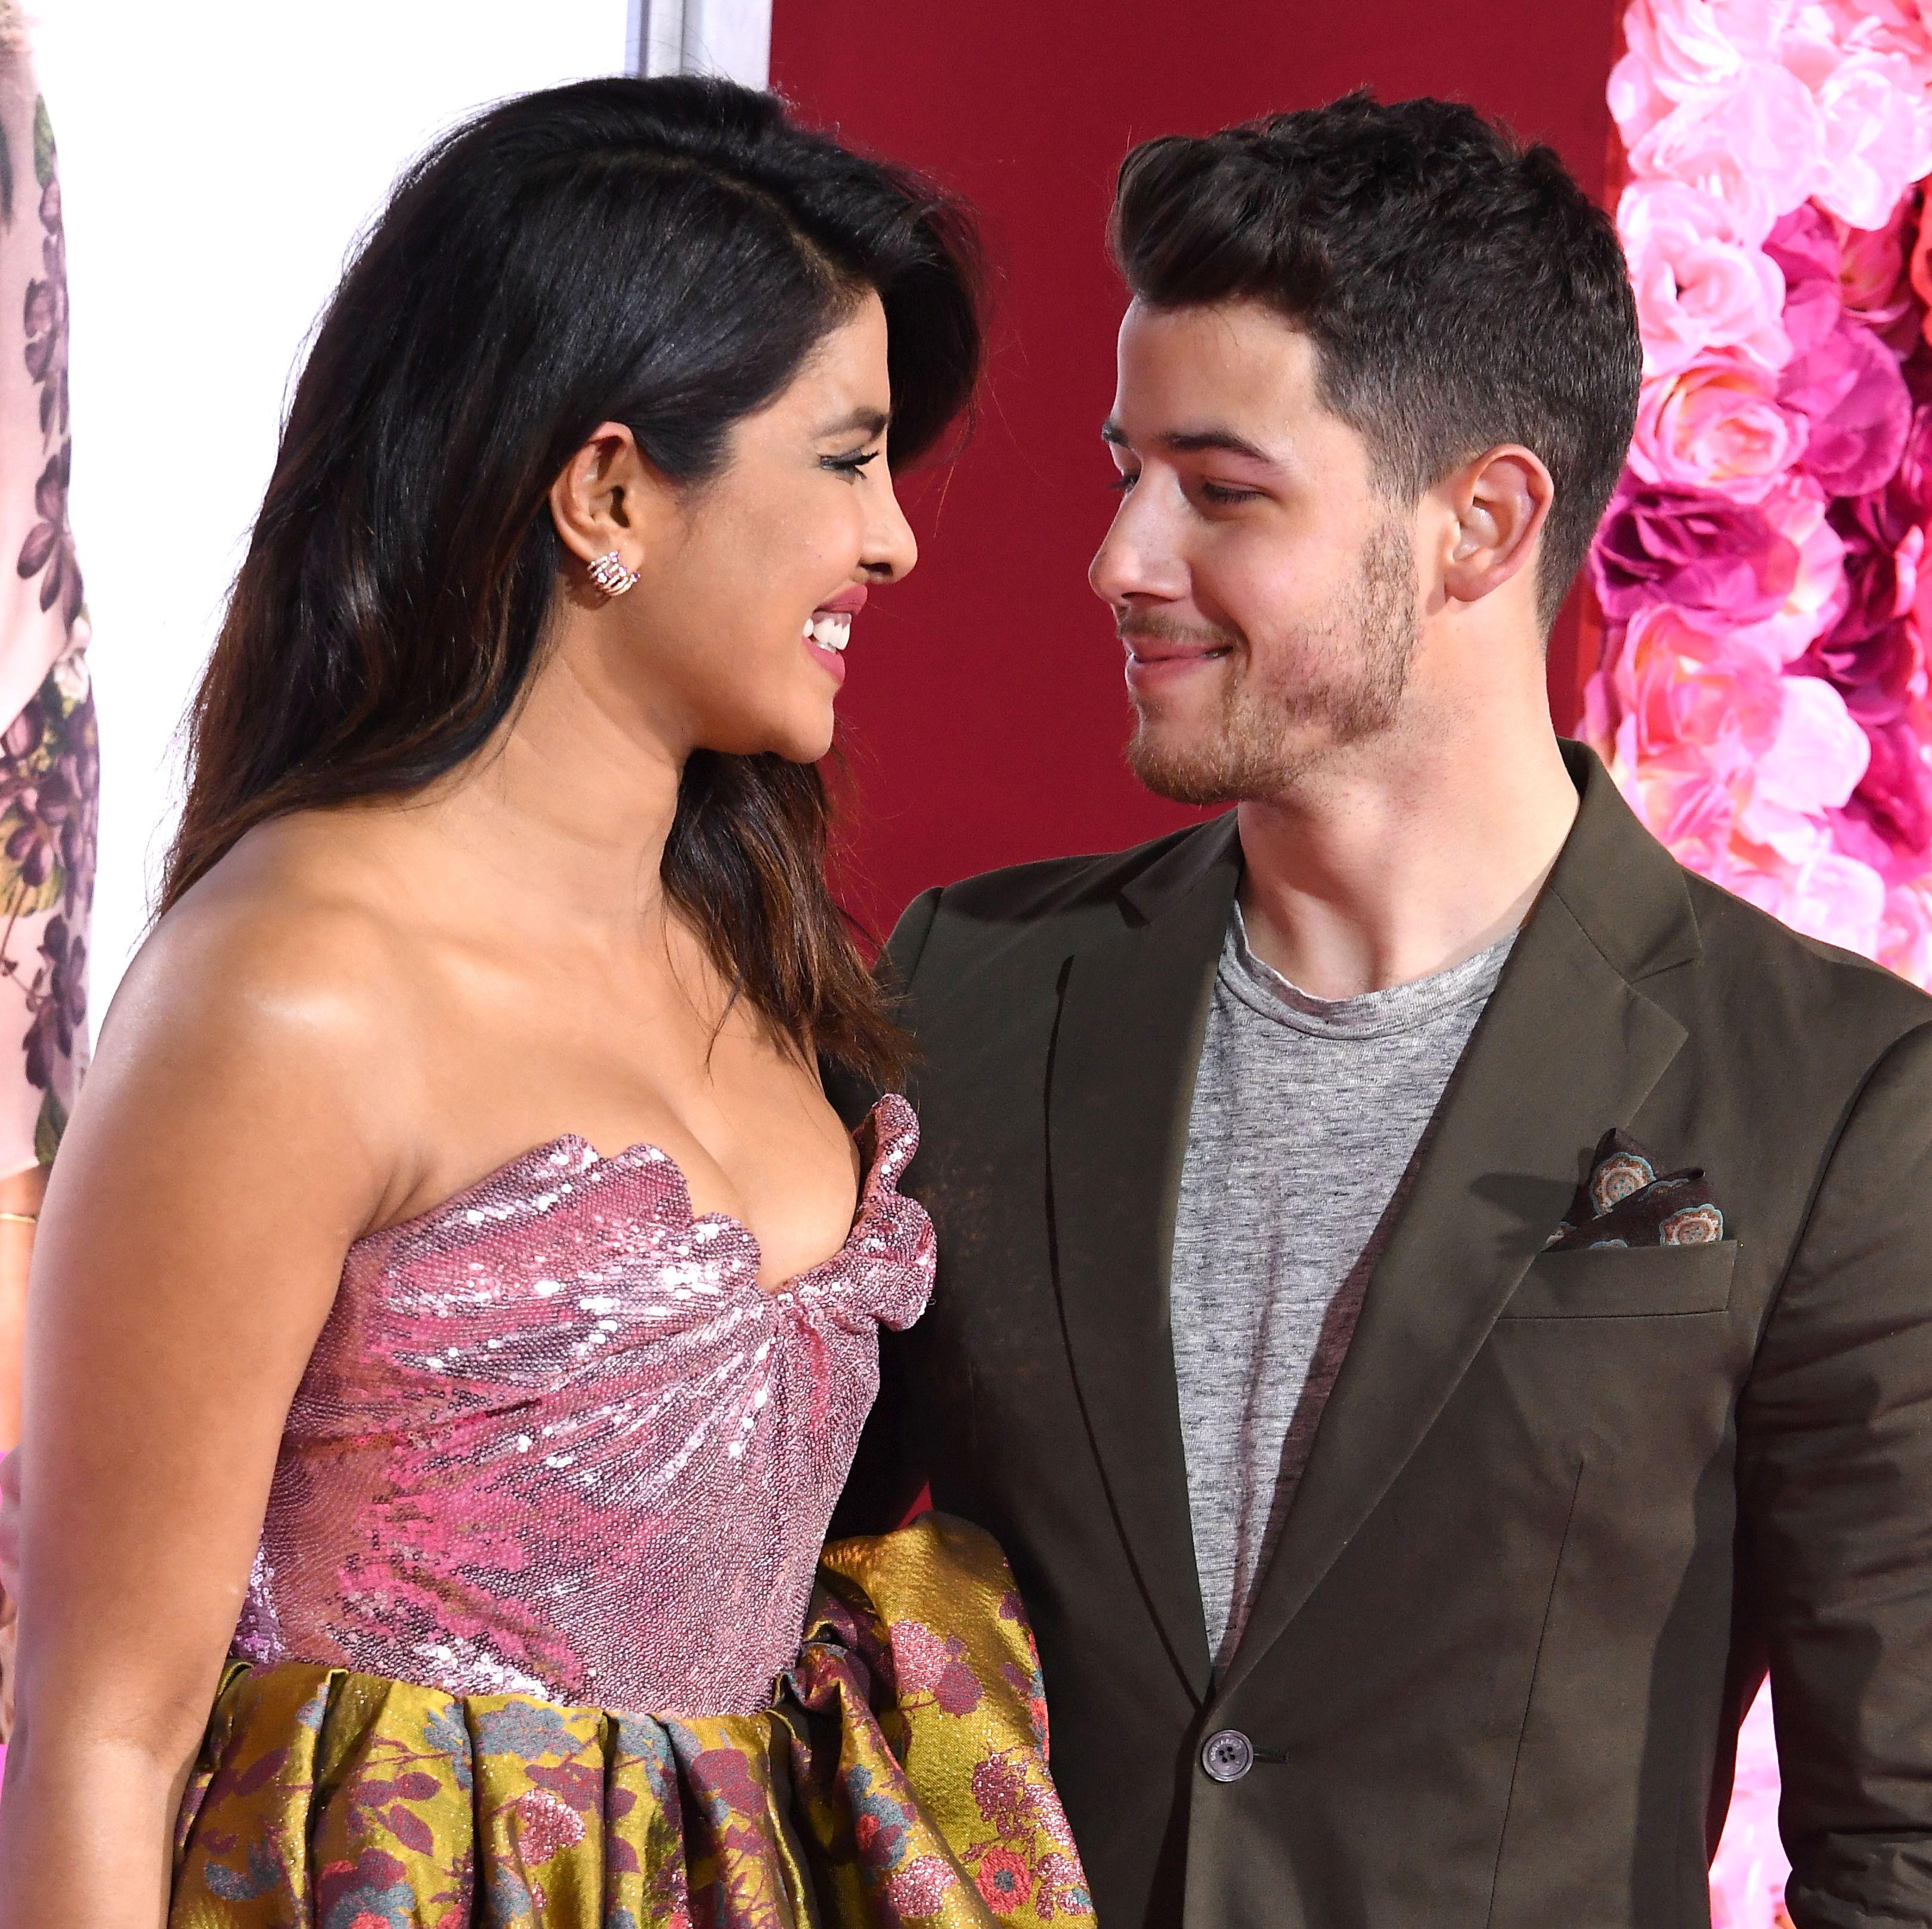 A Comprehensive Timeline of Nick Jonas and Priyanka Chopra's Fairytale Romance